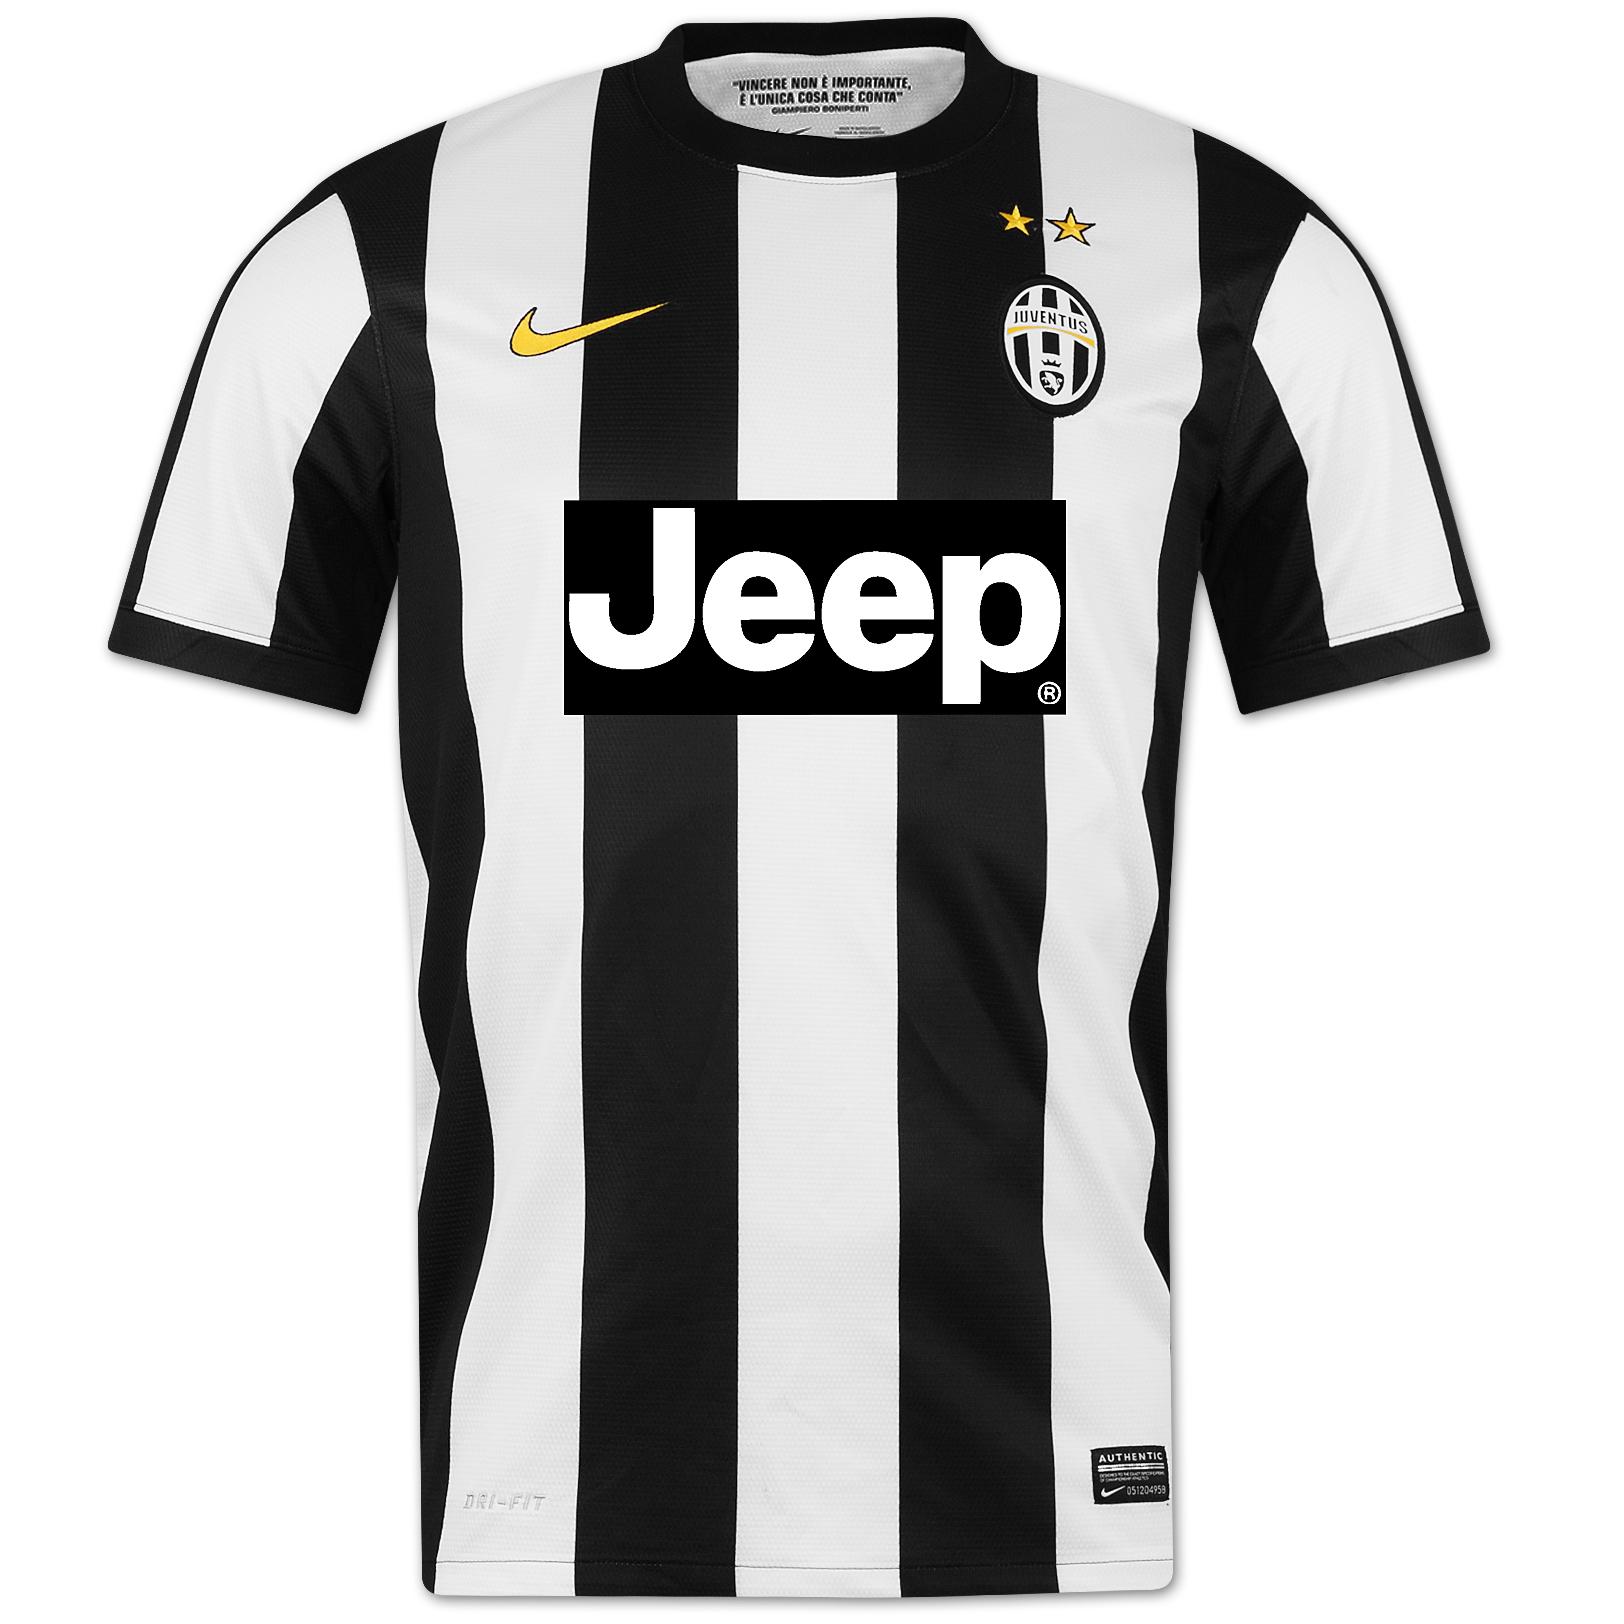 Juventus - Hjemmebanetrøje 2012/13 Authentic